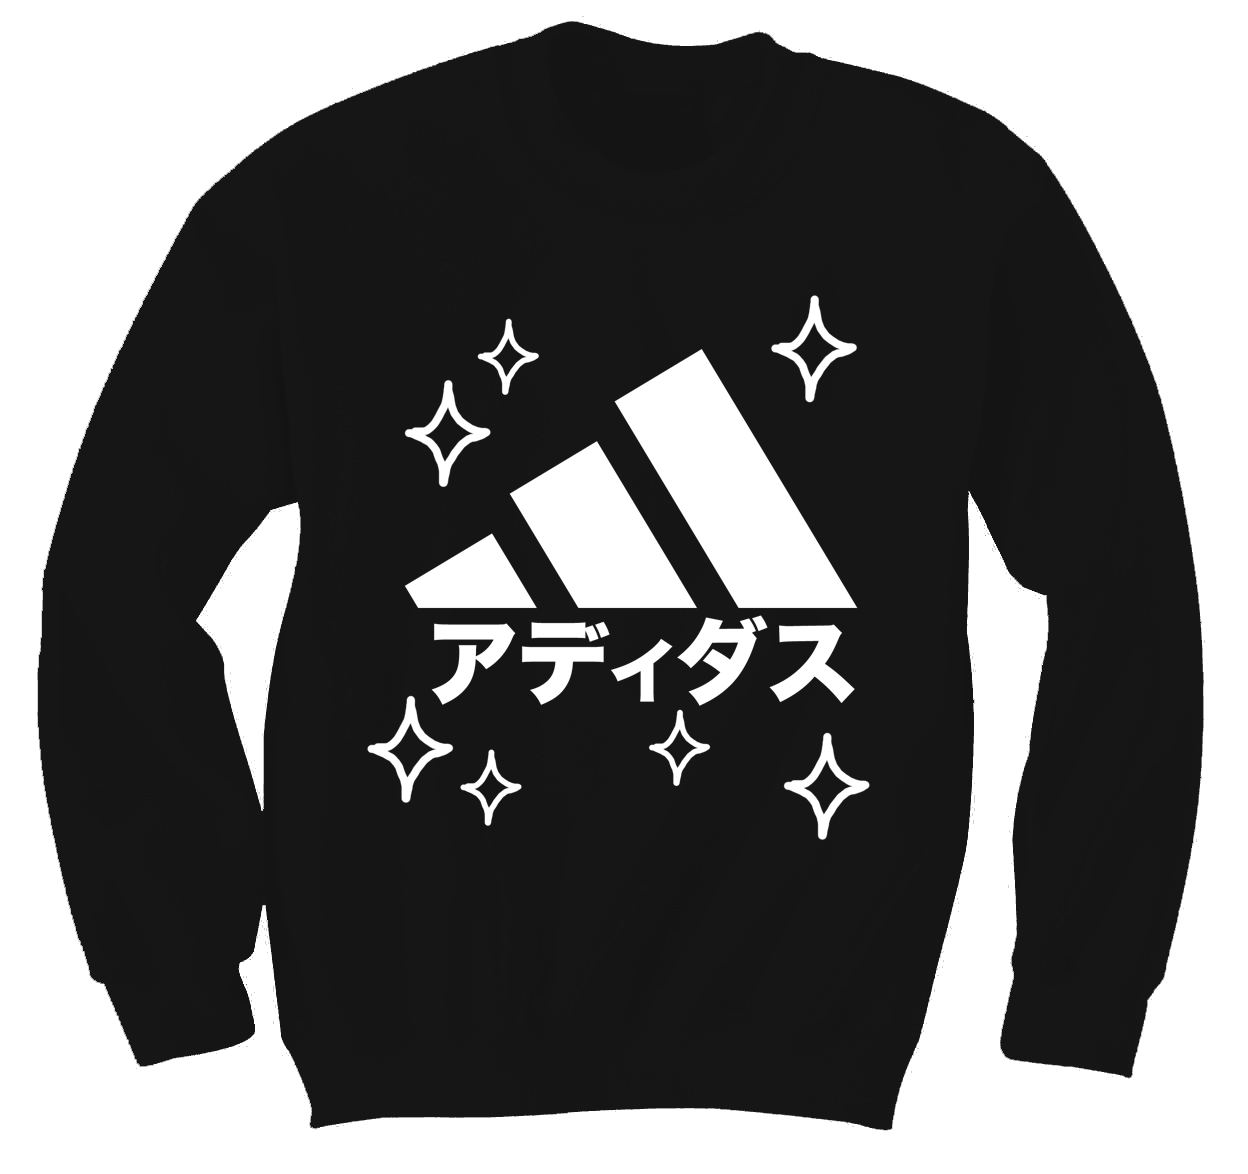 nike-adidas-4-sweater-sweatshirt-fleece-crewneck-adidasu-2-naiku-japanese-letters-katakana-kawaii-cute-white-black-t-shirt-tee-inu-inuinu-shopinuinu-sport-logo-heart-brand_original